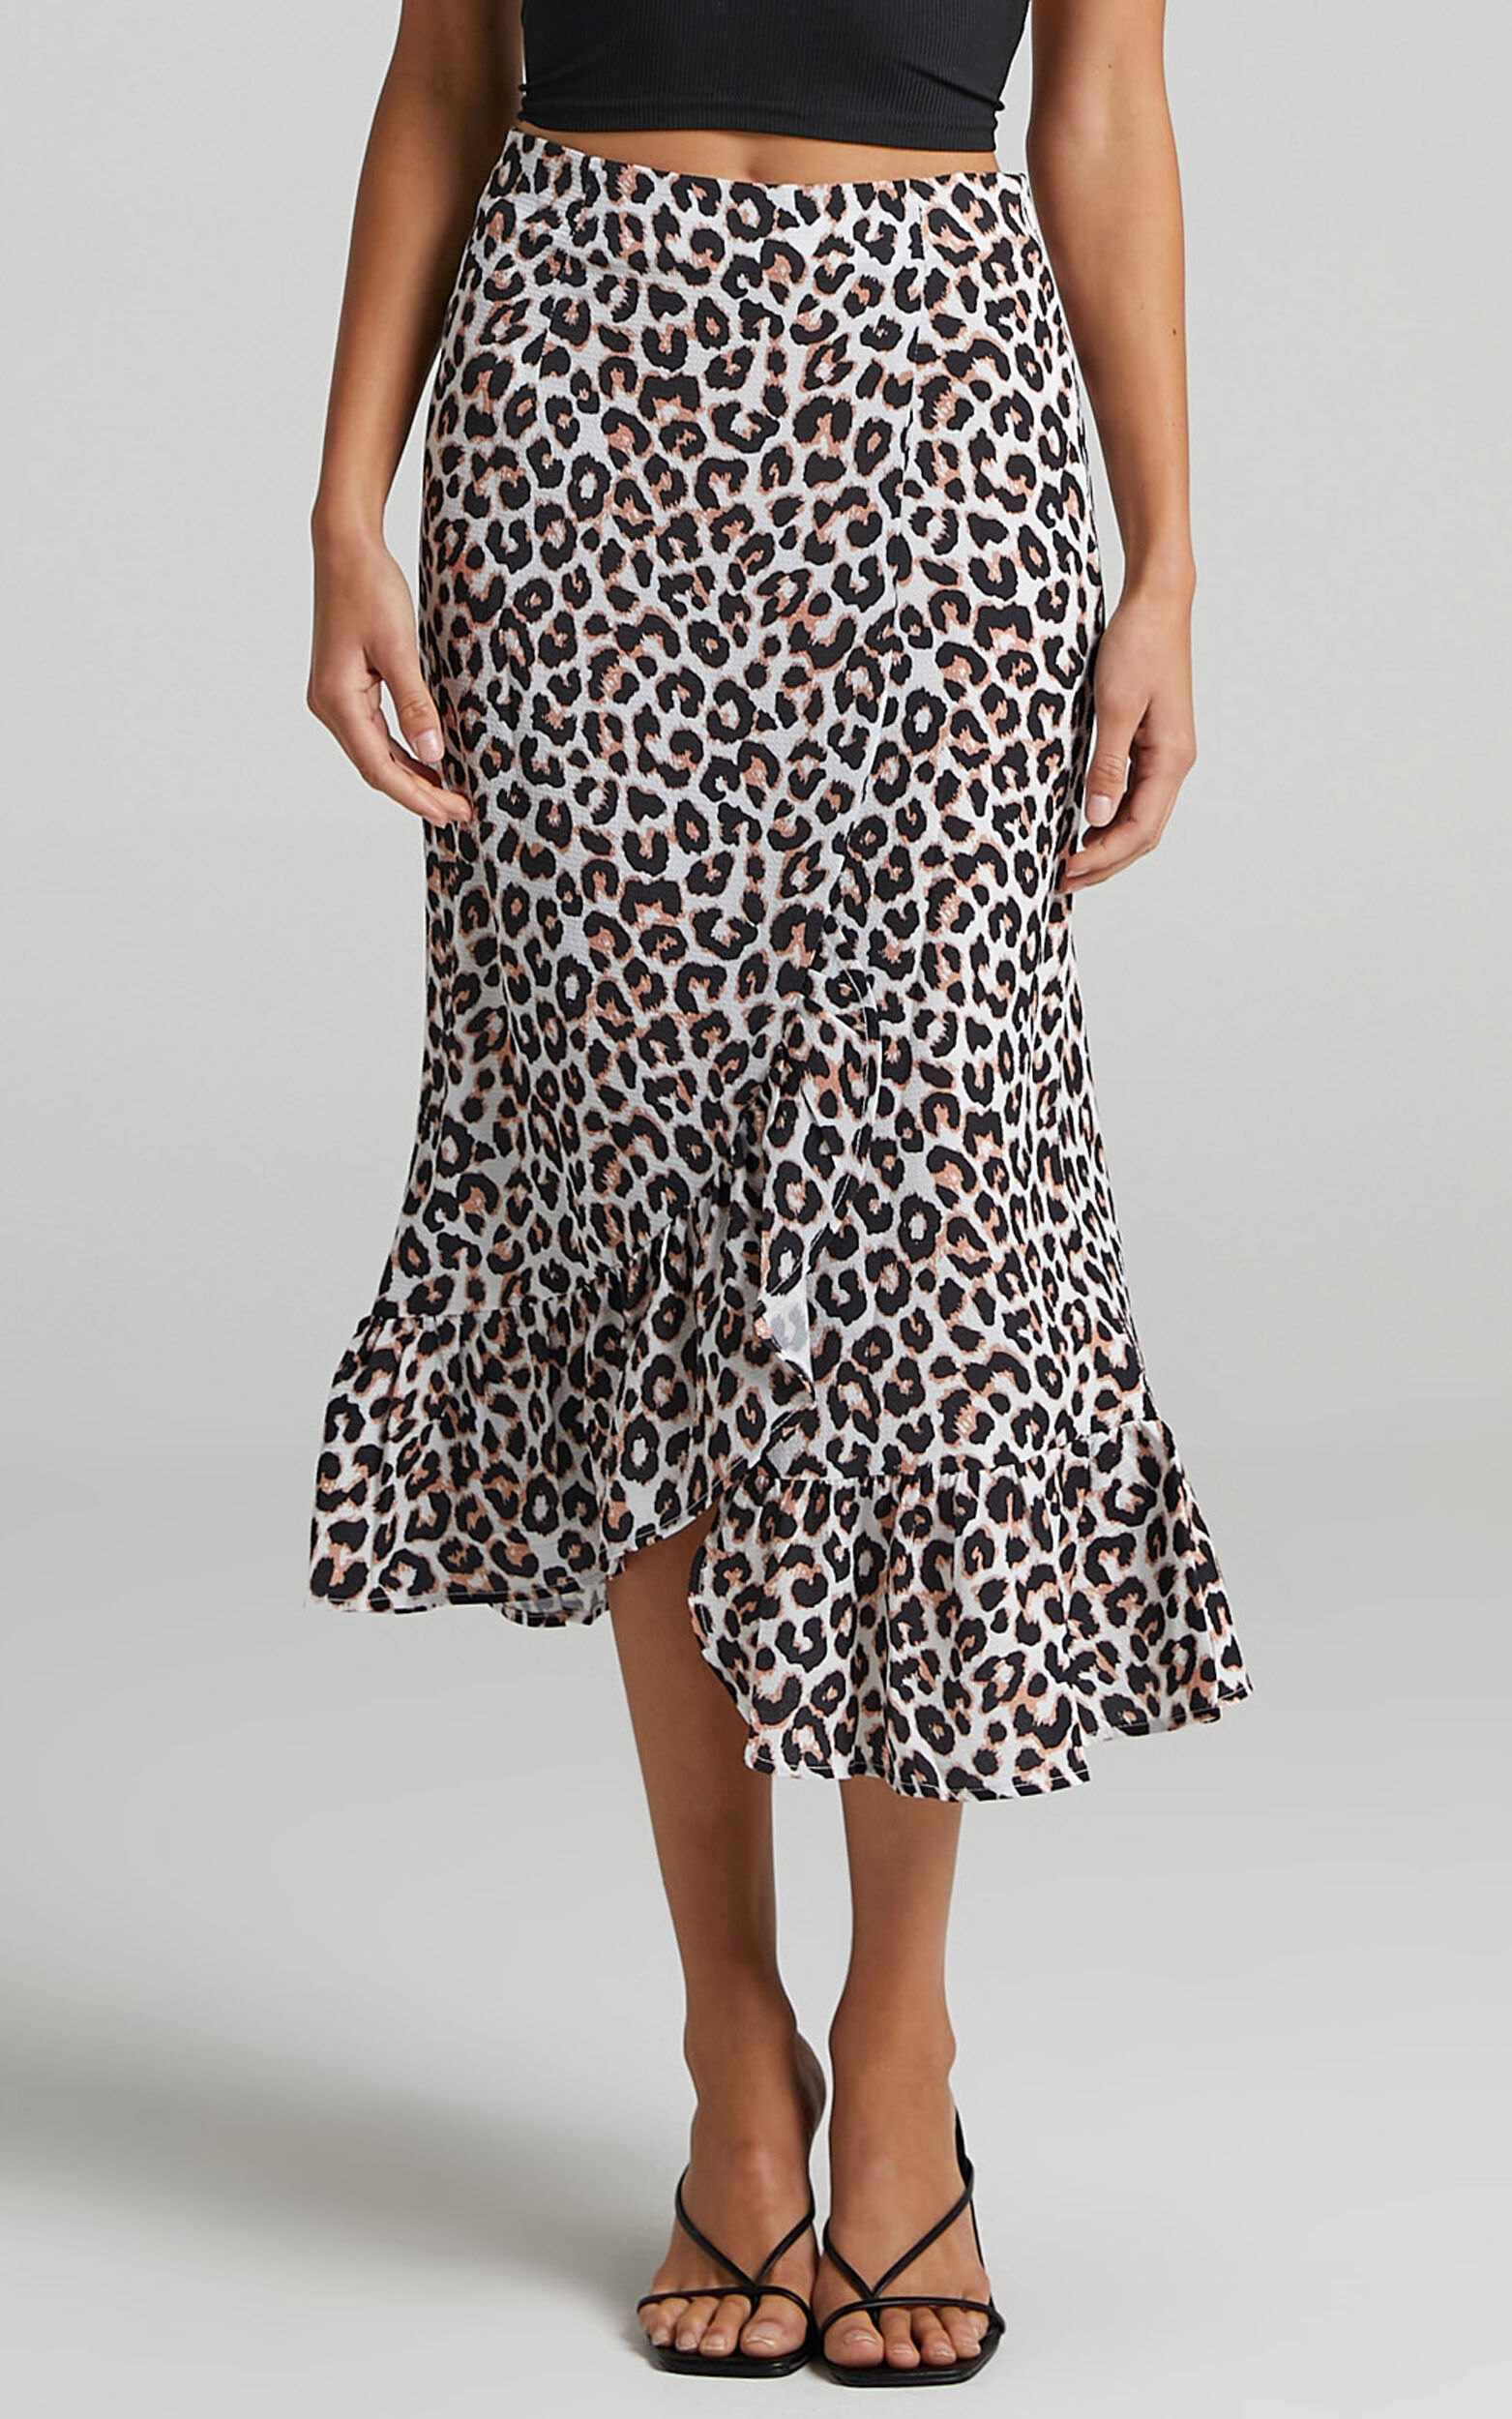 Keep Me Amused Midi Skirt in Leopard Print - 14, BRN1, super-hi-res image number null